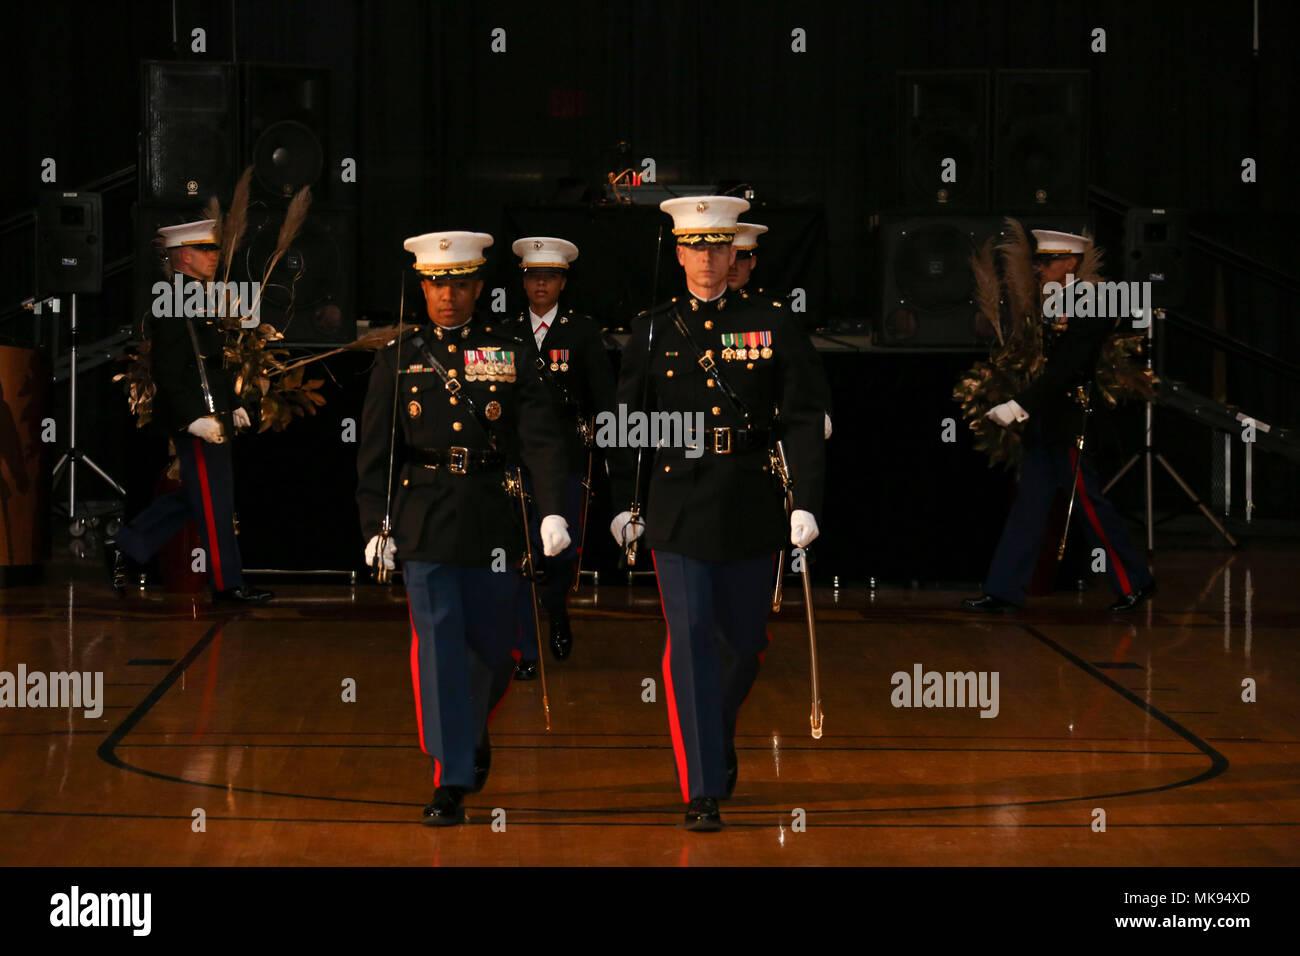 Marine Corps Installations East Stock Photos & Marine Corps